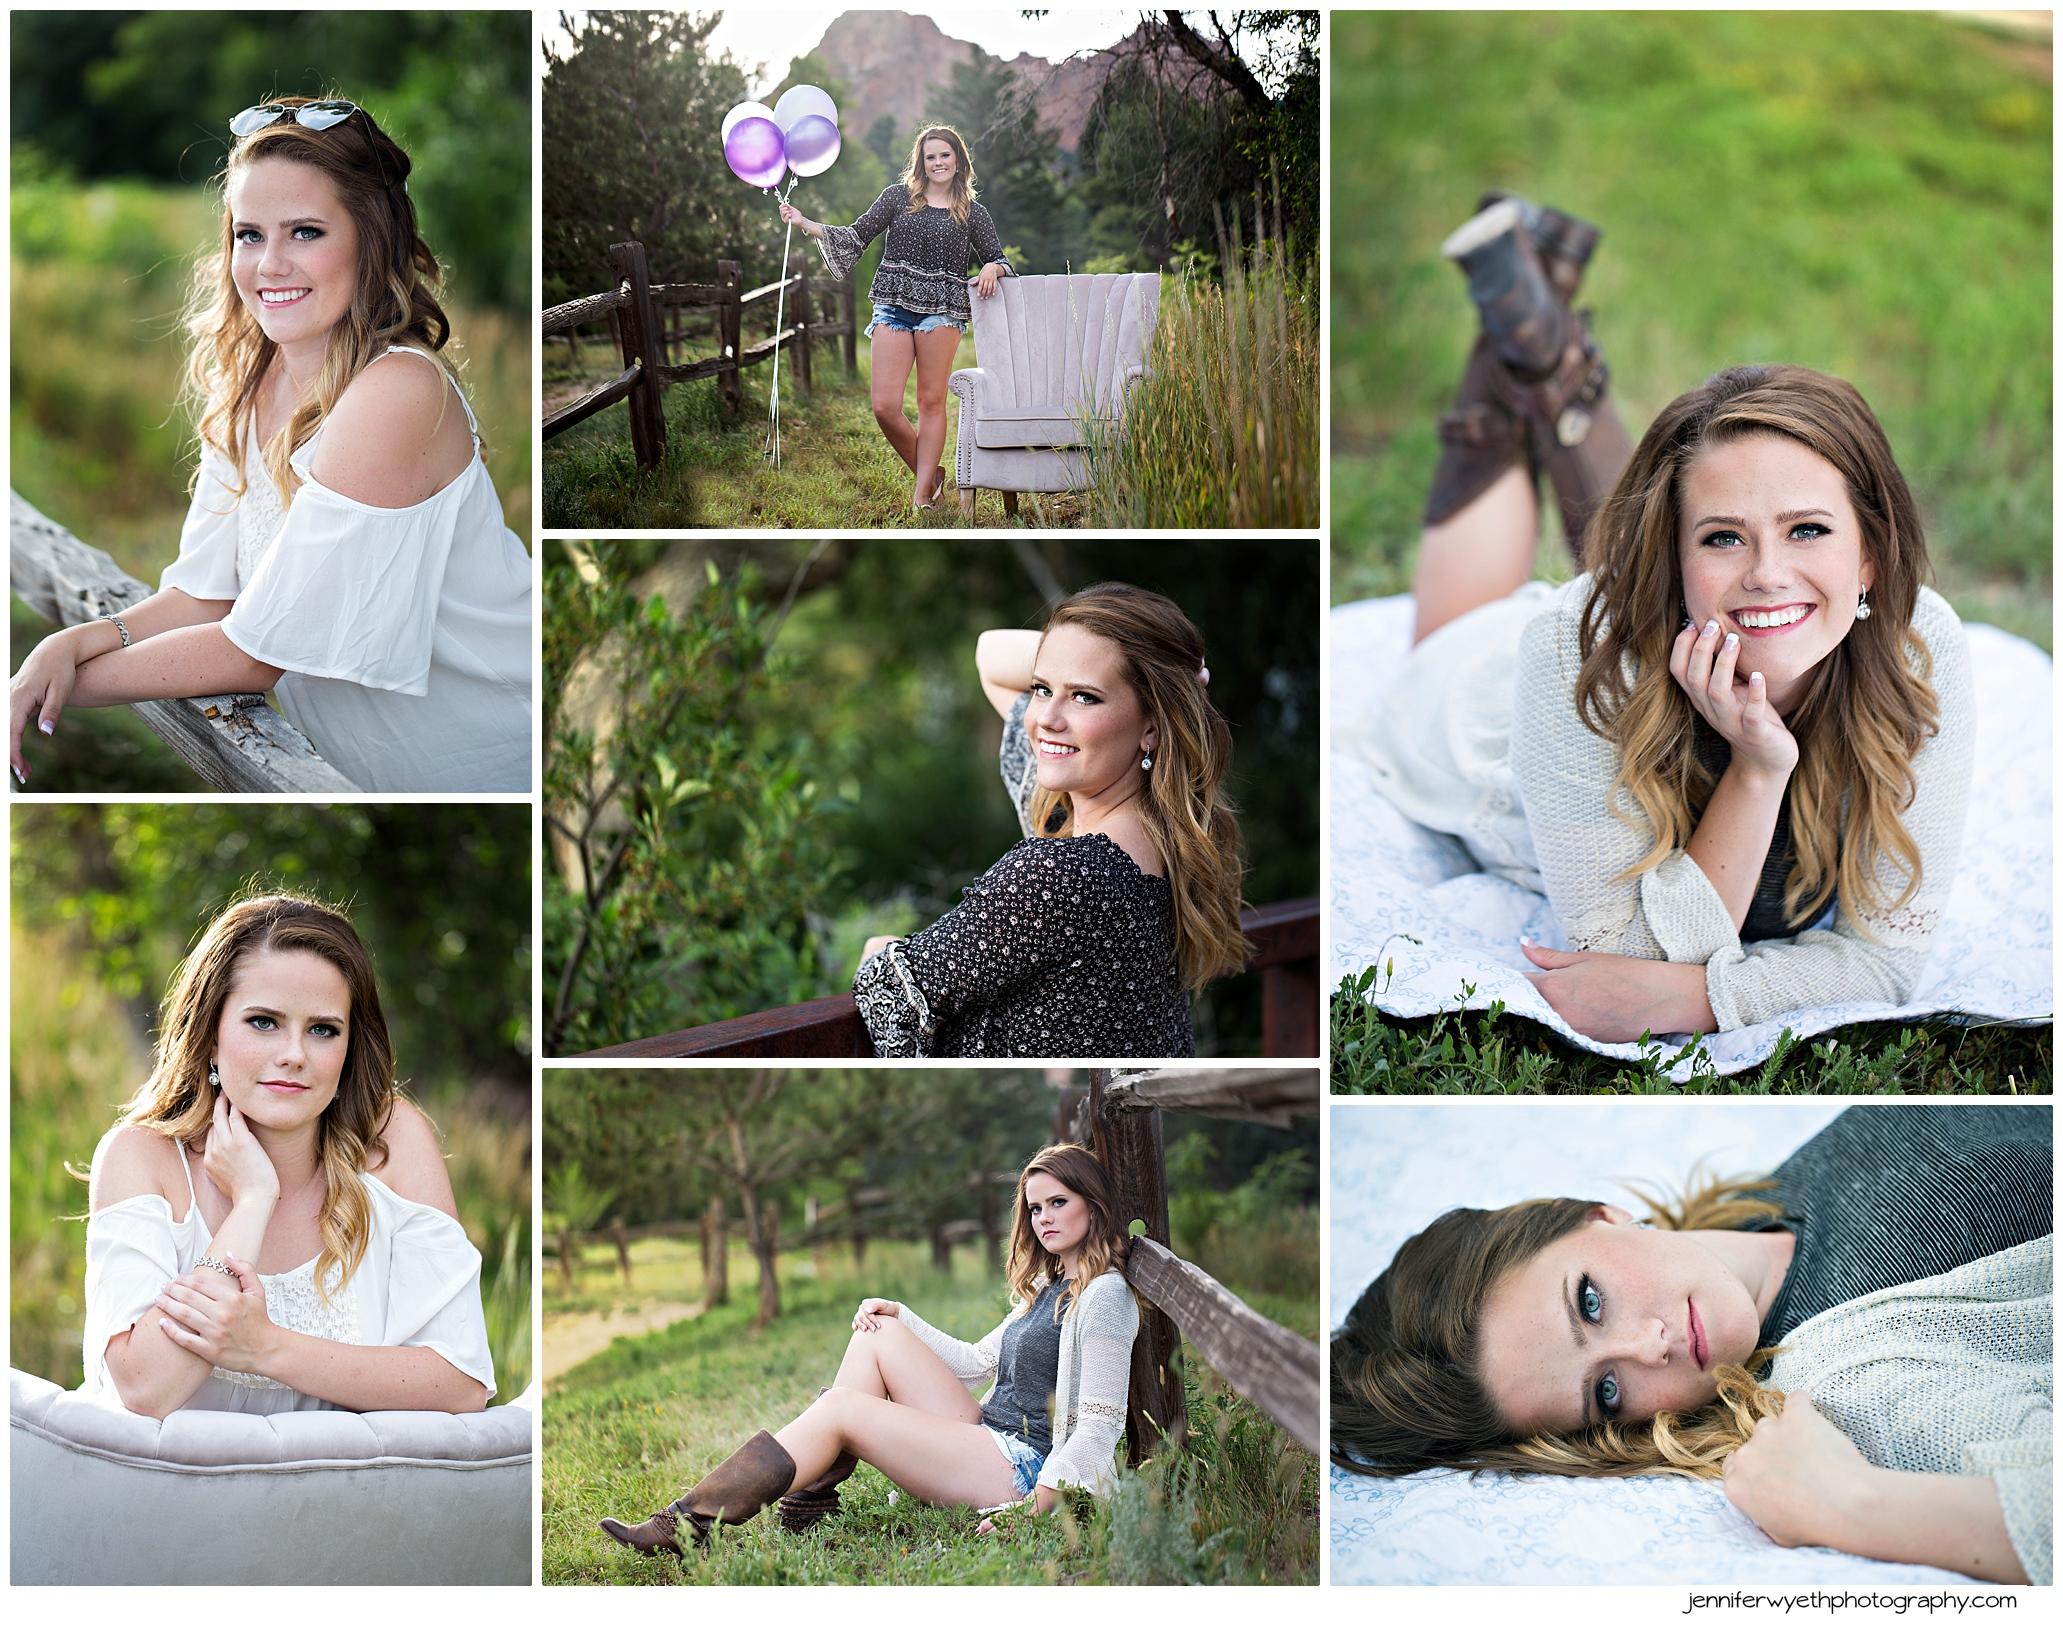 Jennifer-Wyeth-photography-senior-pictures-colorado-springs-photographer_0165.jpg